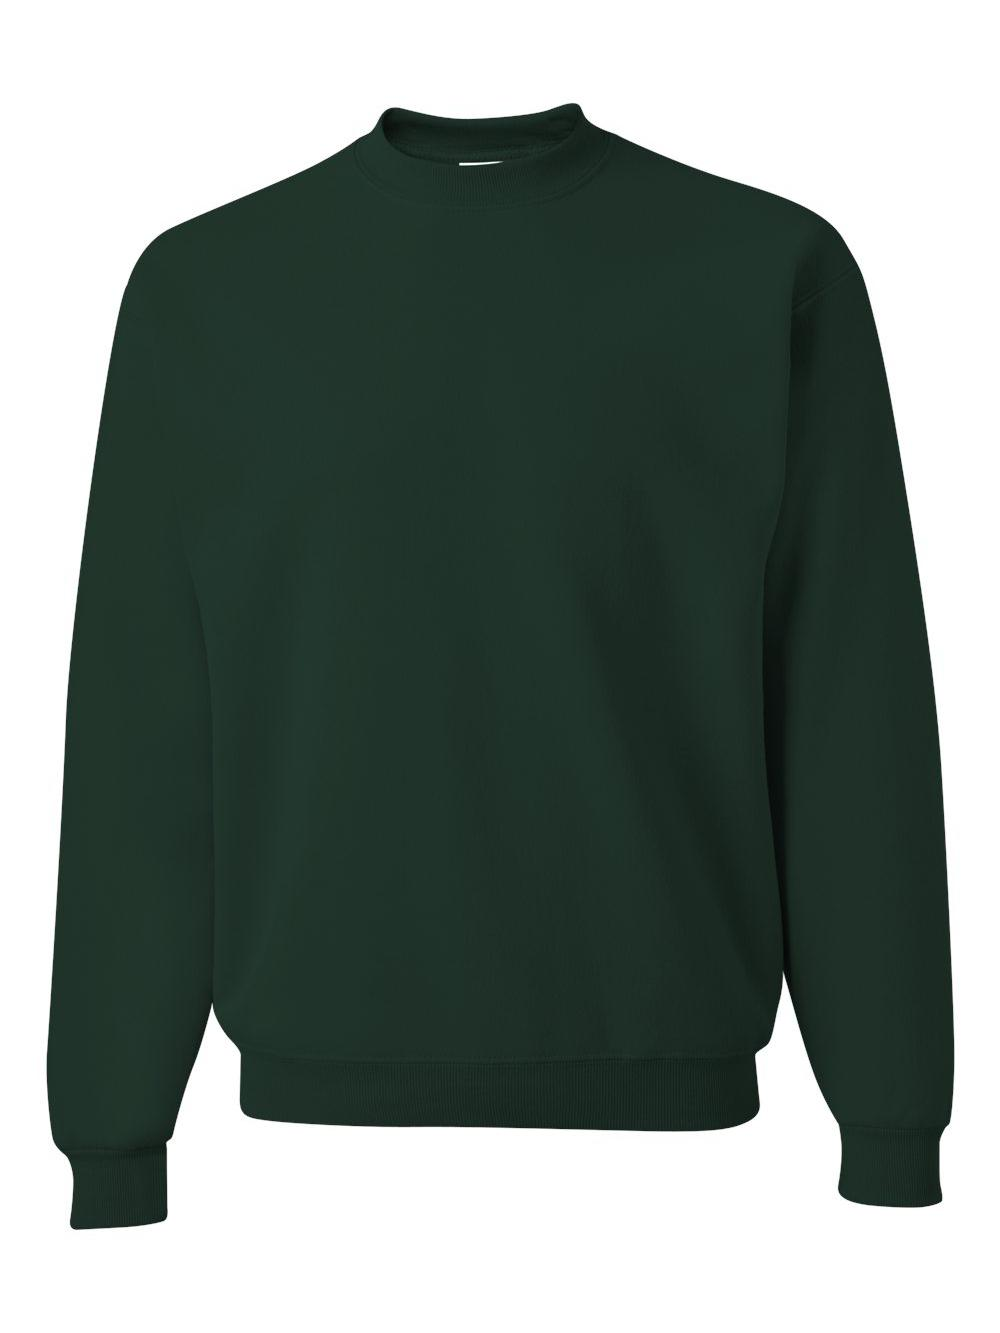 Jerzees-NuBlend-Crewneck-Sweatshirt-562MR thumbnail 39